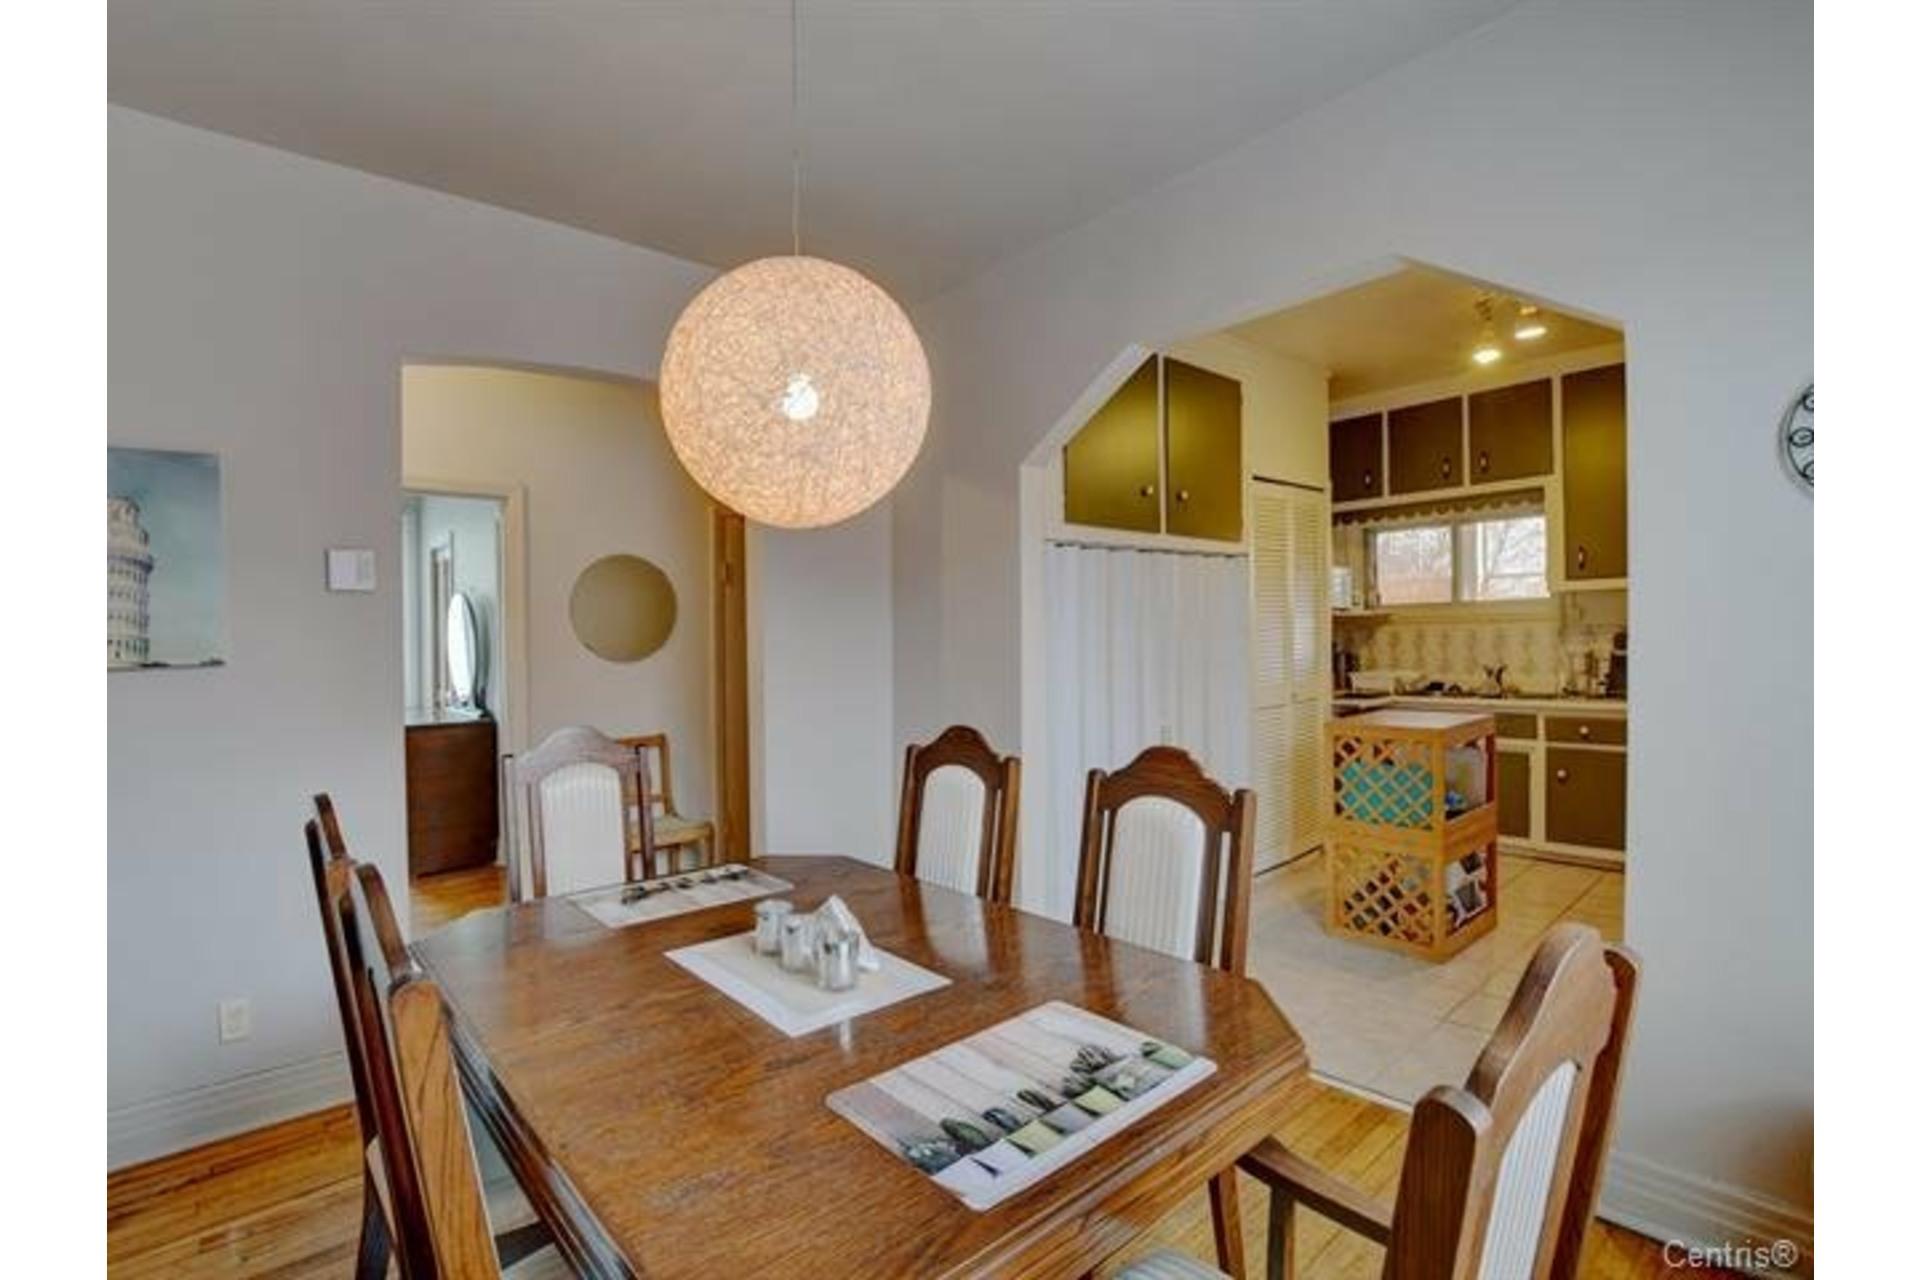 image 30 - Duplex En venta Lachine Montréal  - 6 habitaciones